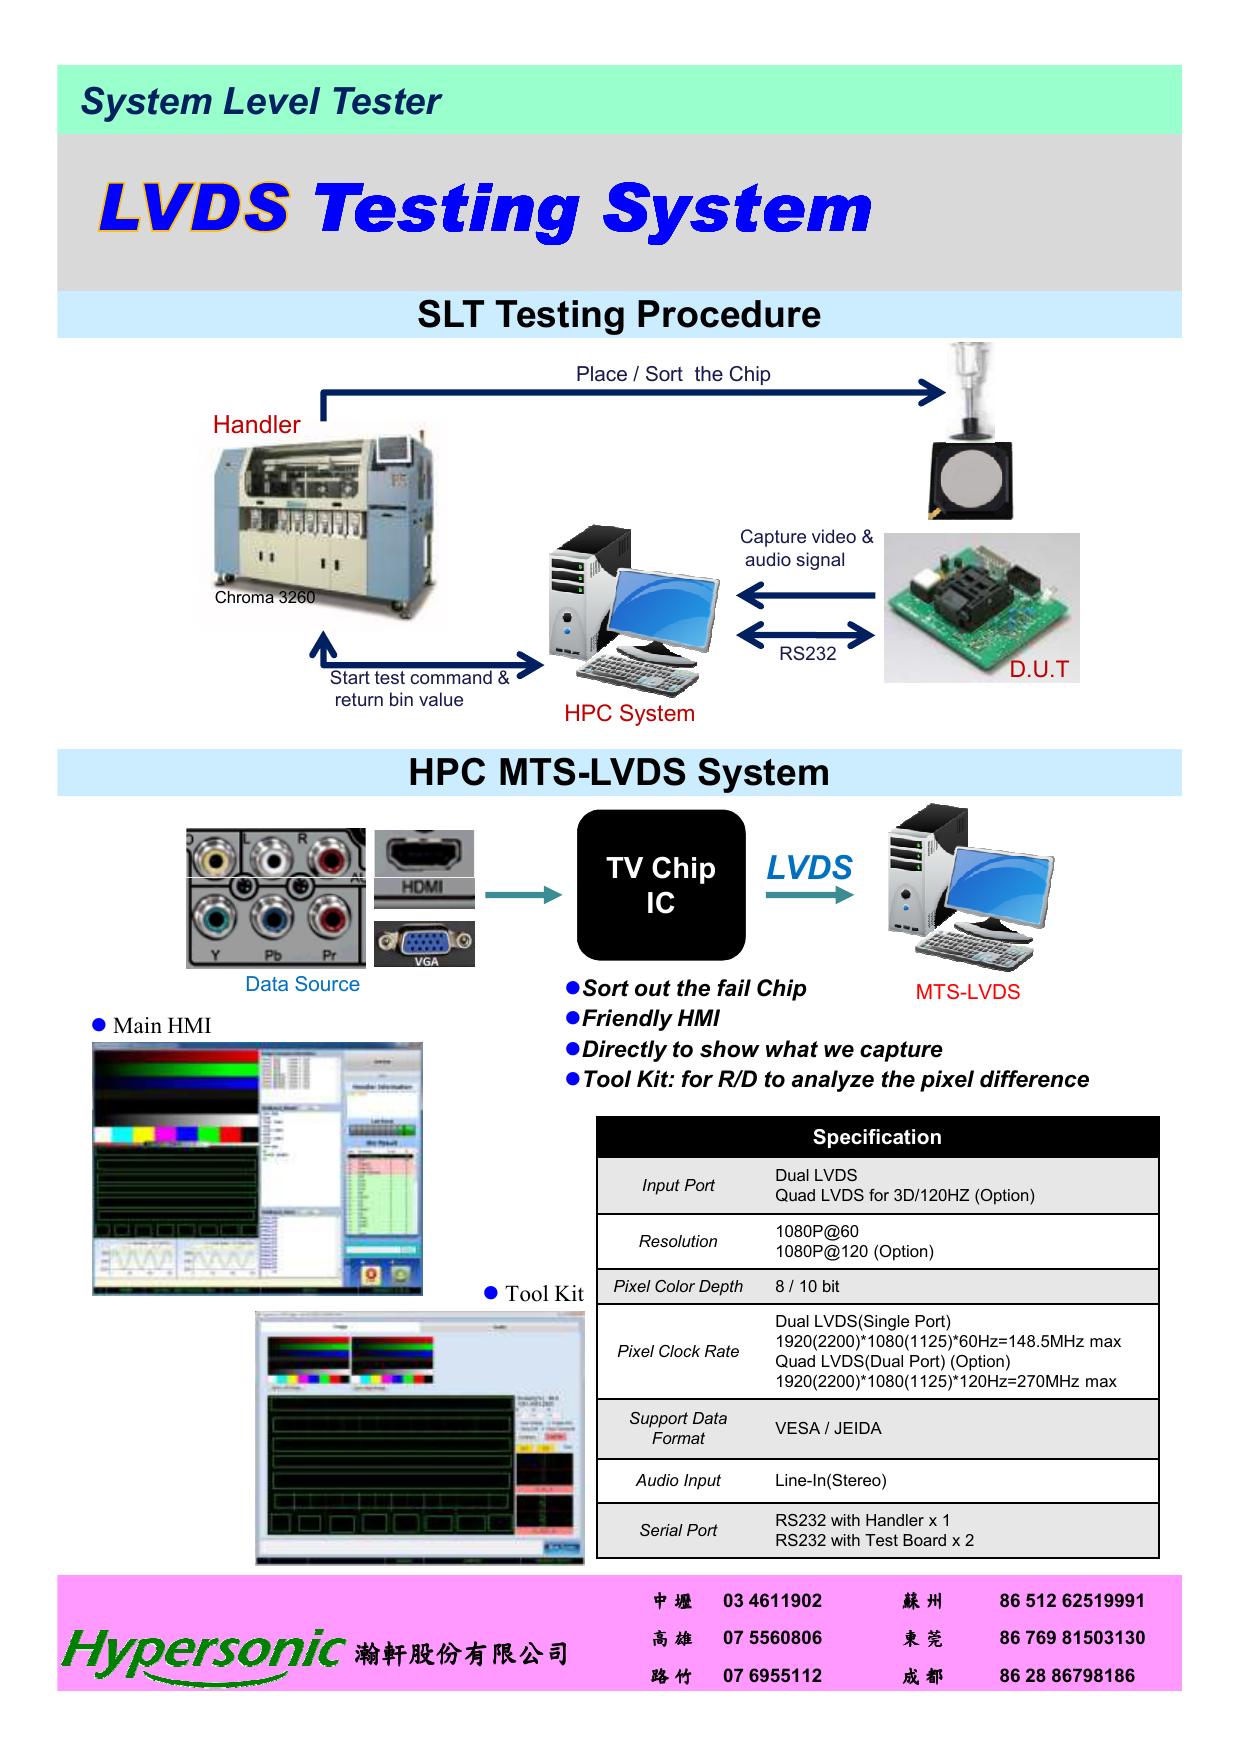 Microsoft PowerPoint - Video Tester \320\315_ 2013_0807